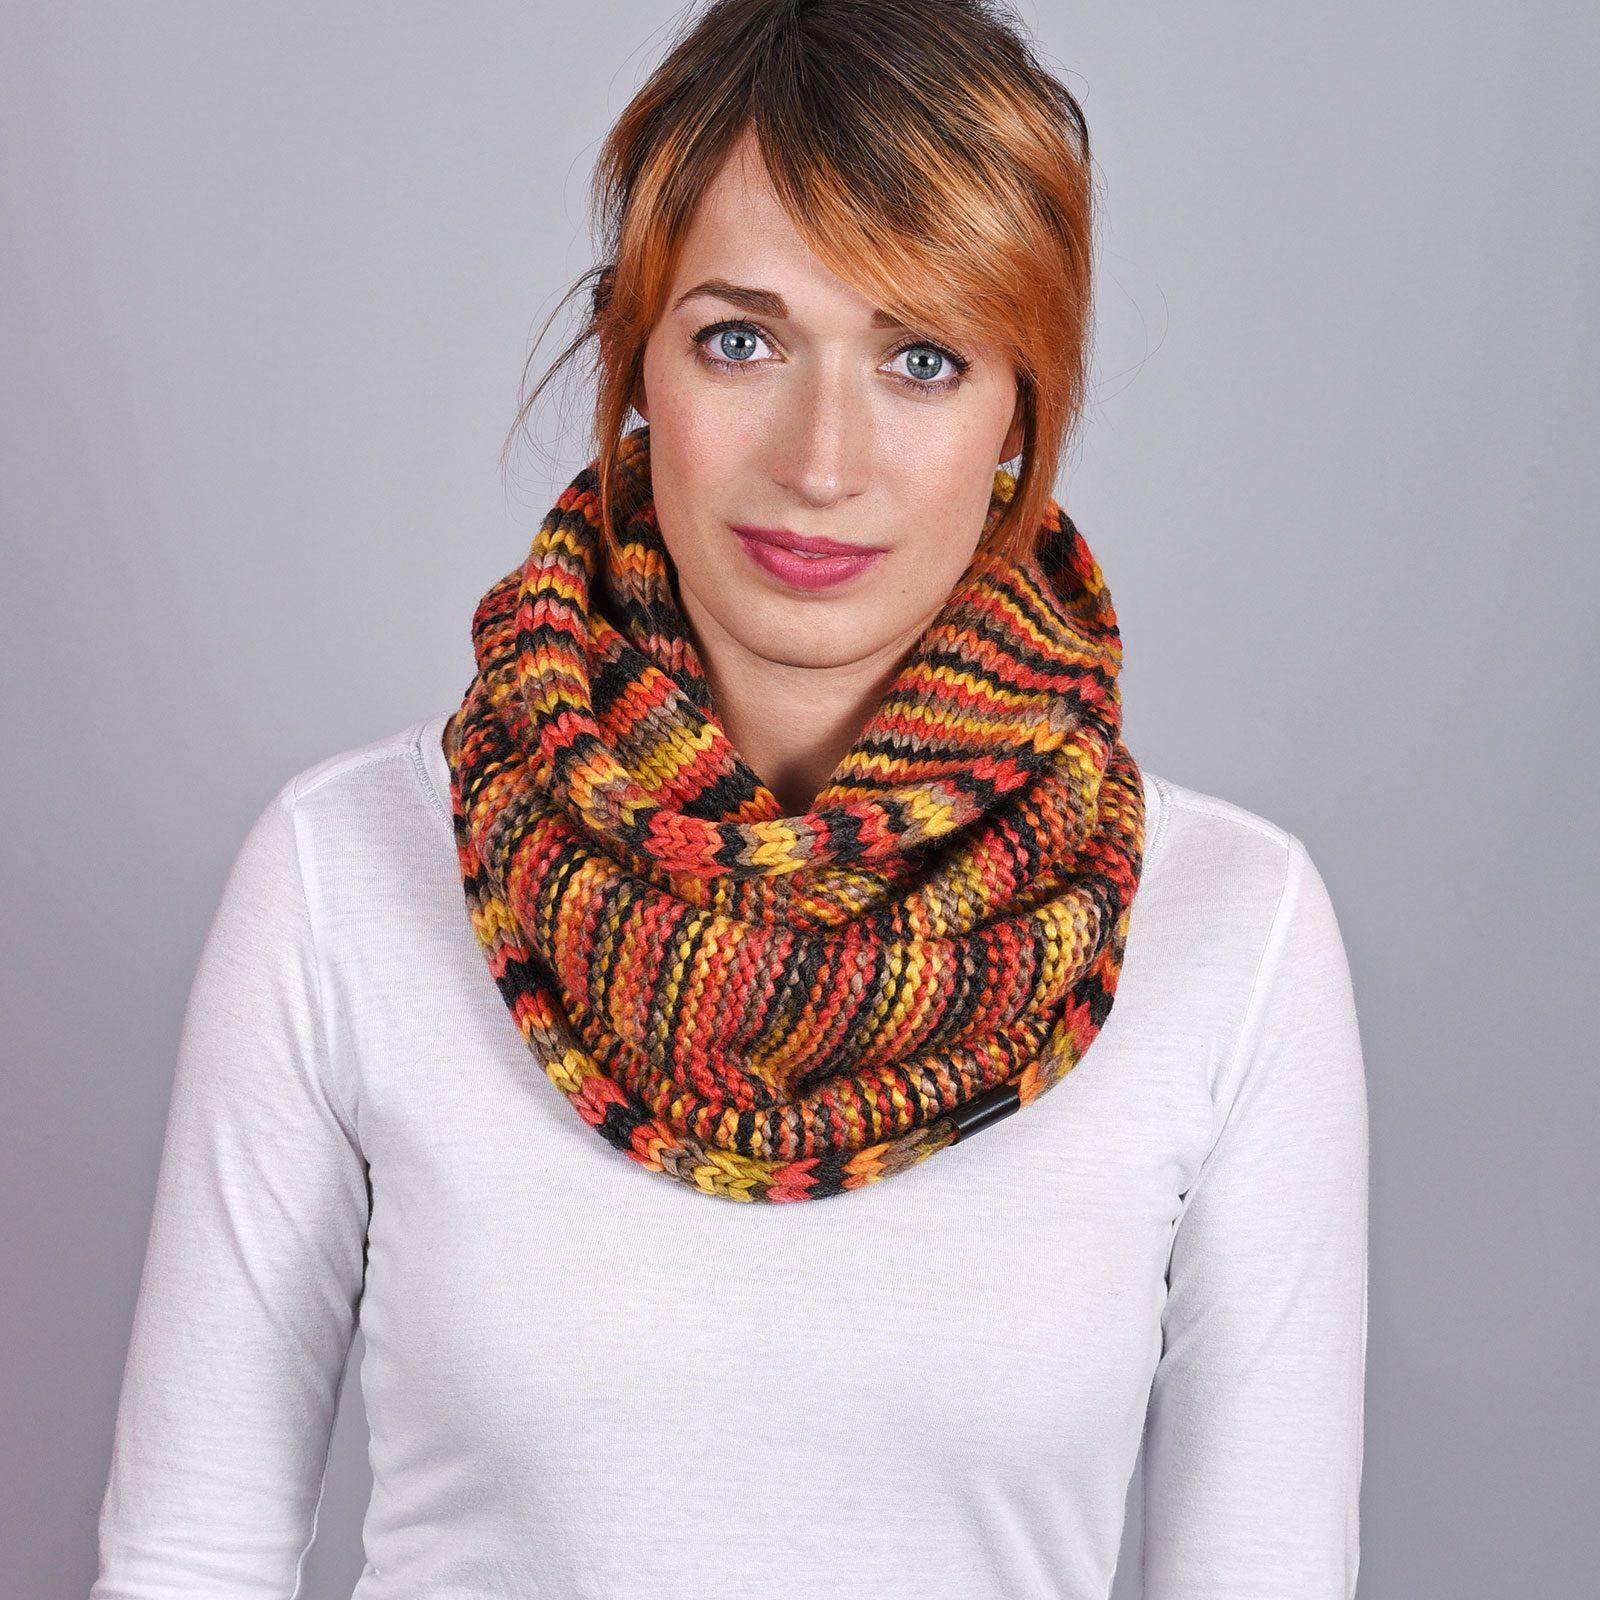 http://lookbook.allee-du-foulard.fr/wp-content/uploads/2018/12/AT-04551-VF16-1-echarpe-snood-multicolore-1600x1600.jpg